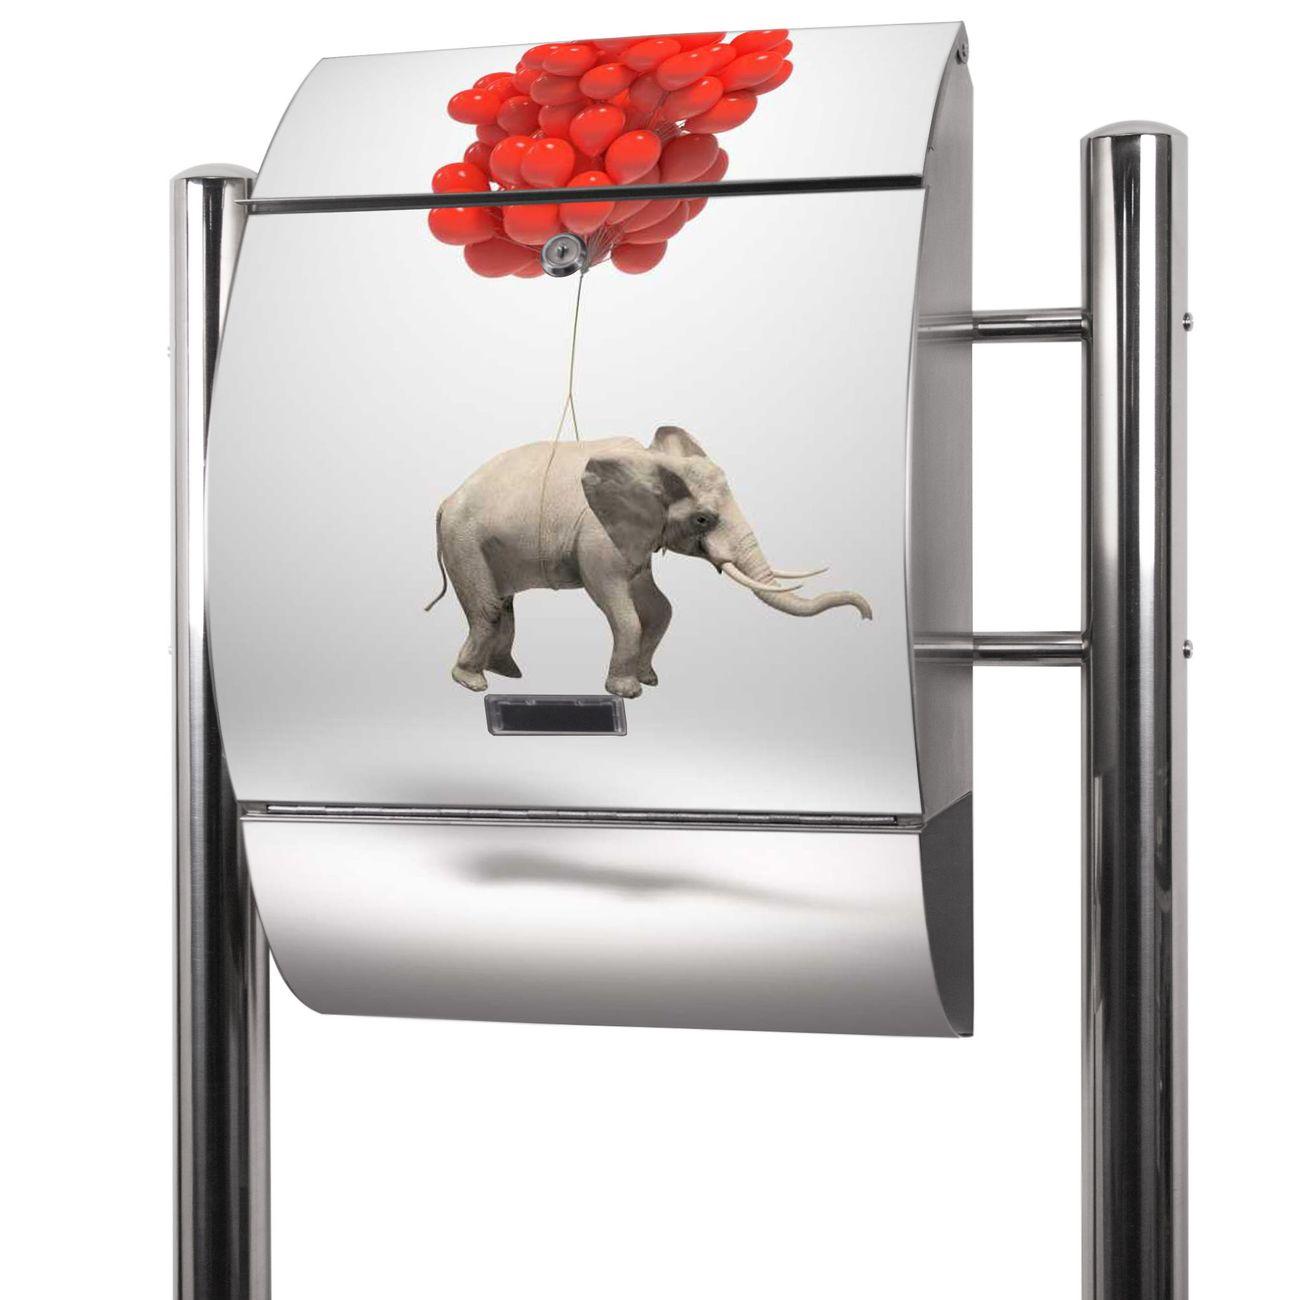 Edelstahl Standbriefkasten Fliegender Elefant